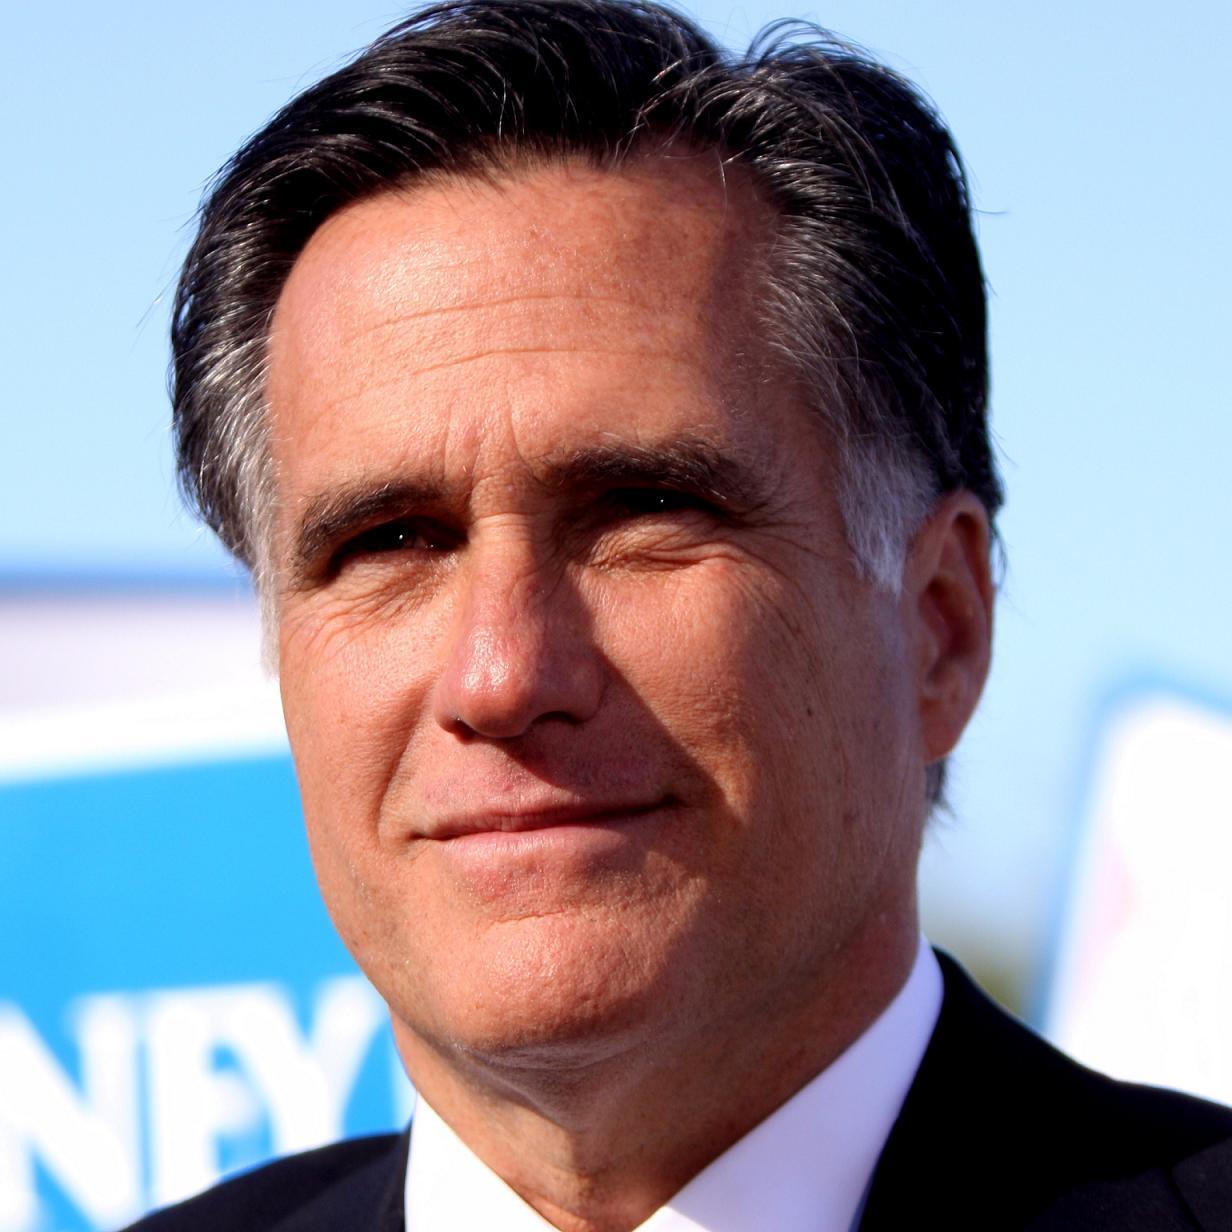 Mitt Romney Bio, Net Worth, Facts